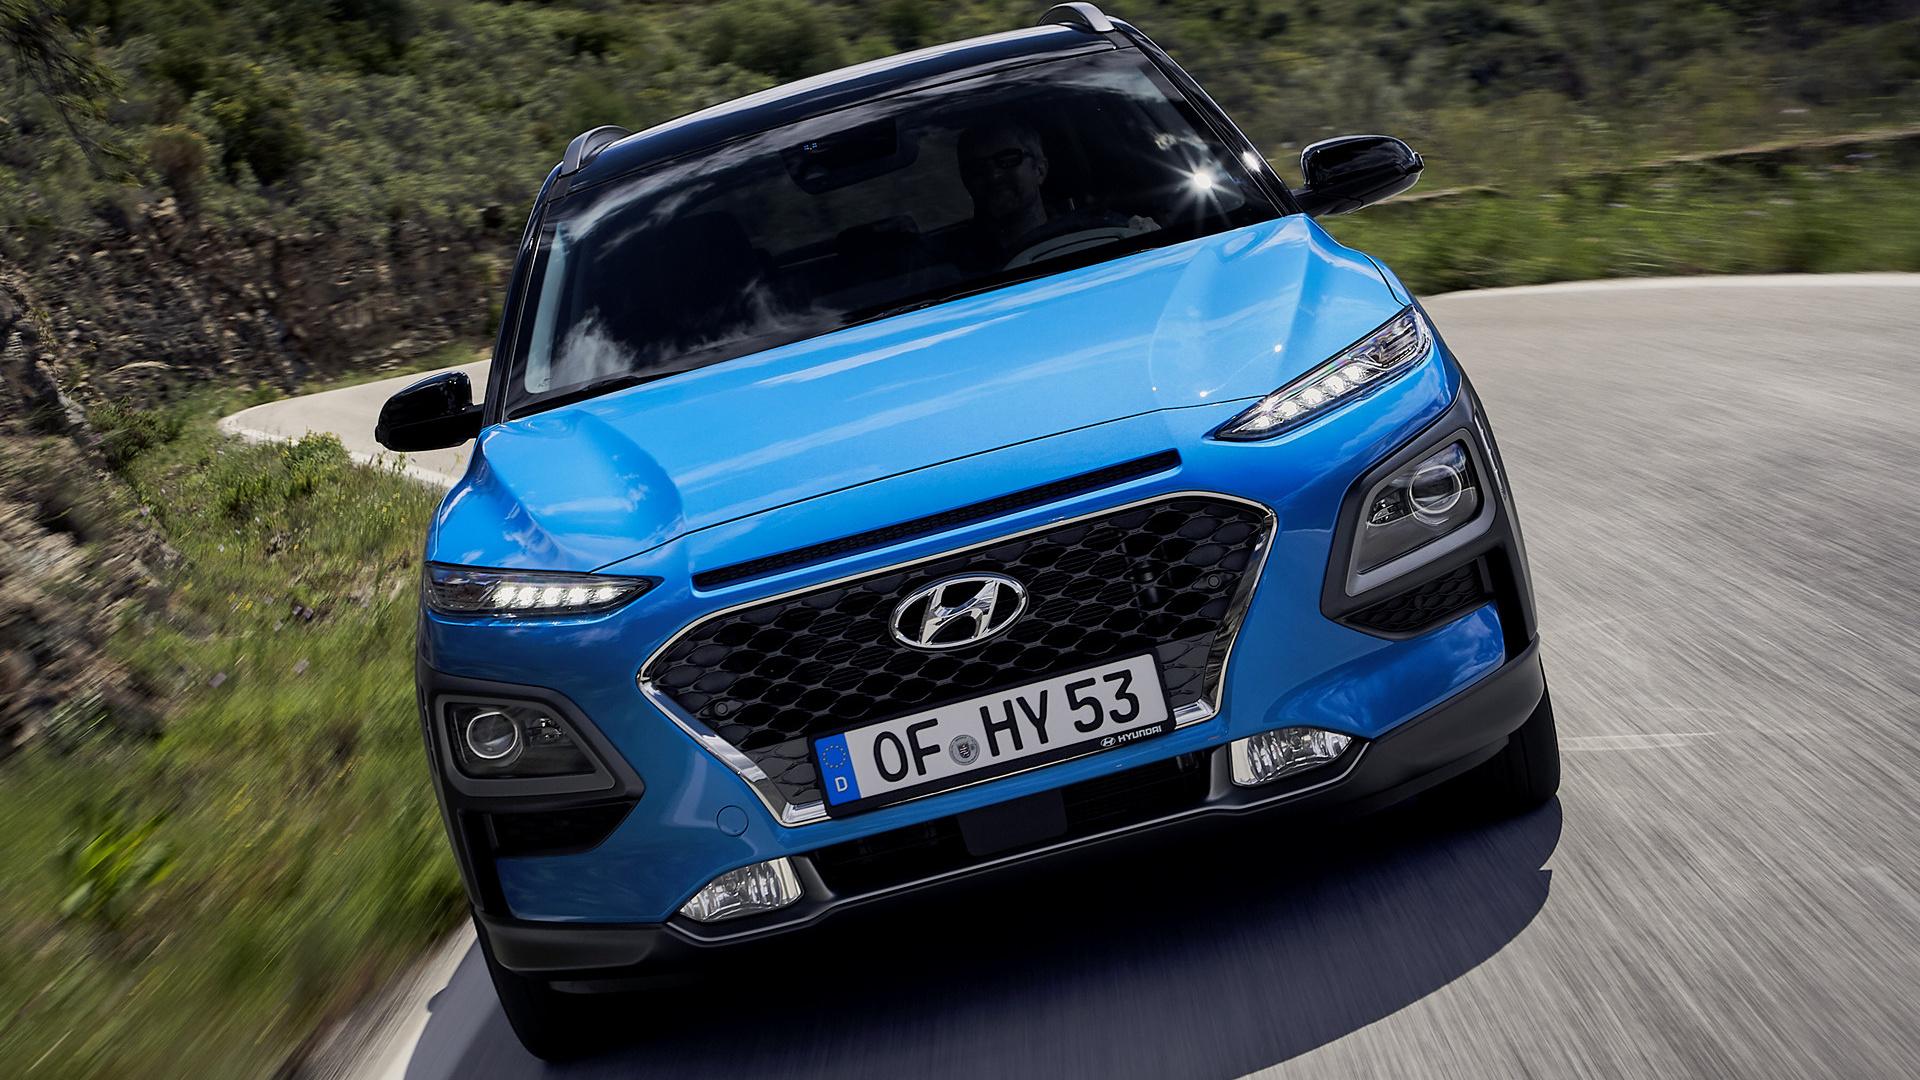 2019 Hyundai Kona Hybrid - Wallpapers And HD Images